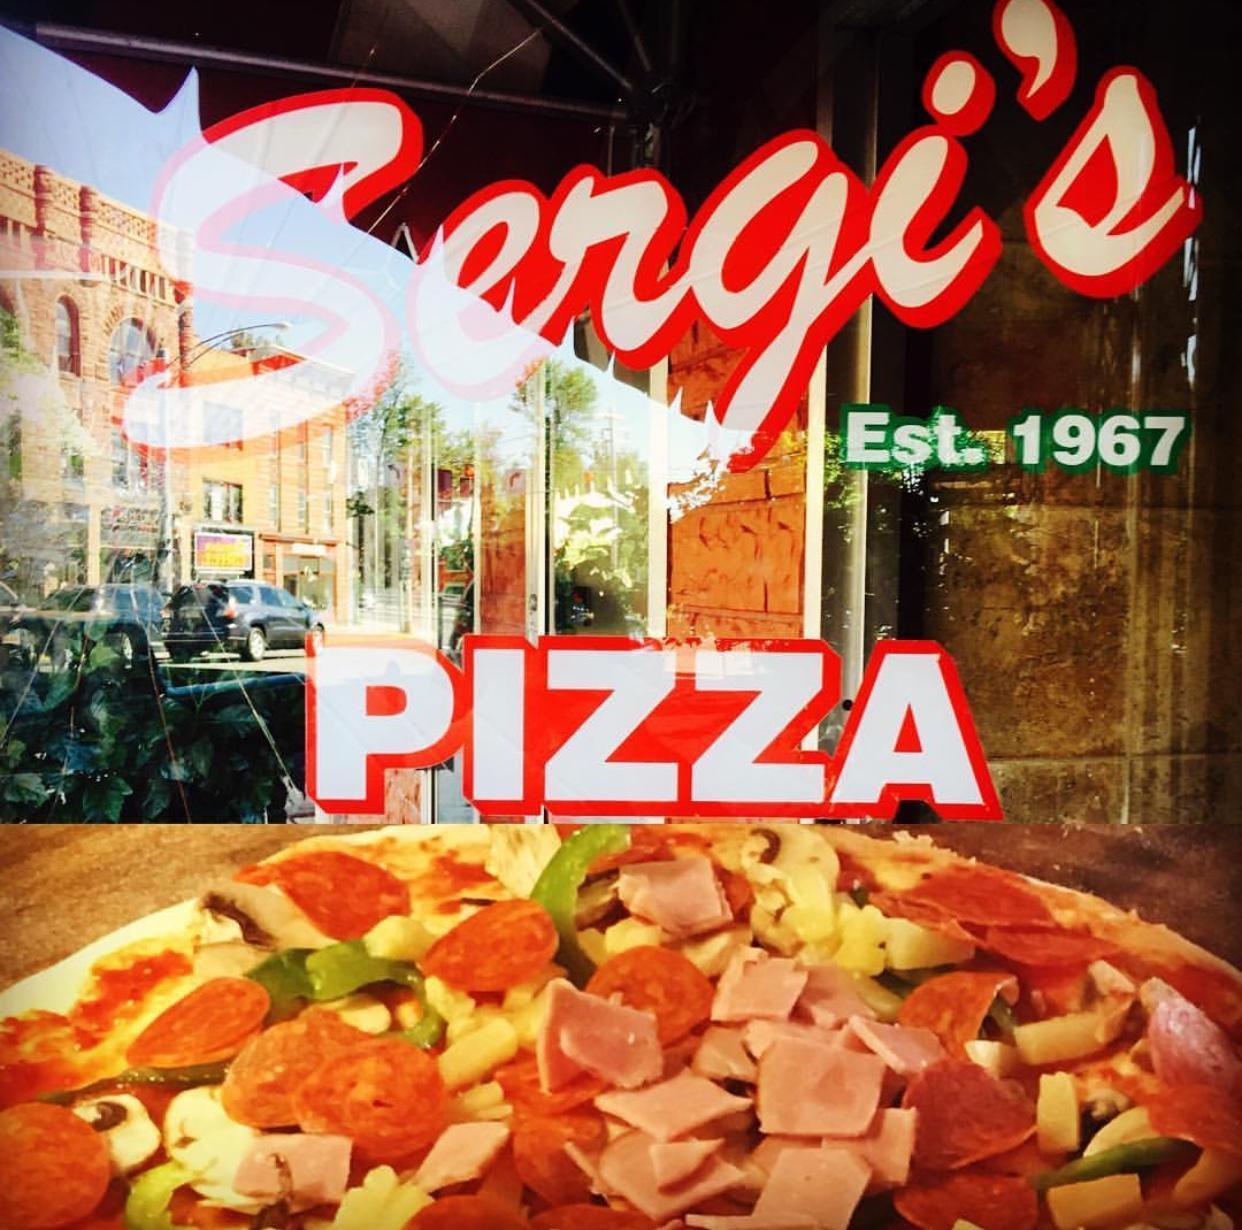 Sergi's Italian Restaurant,  Pizzeria & Banquet Hall image 0